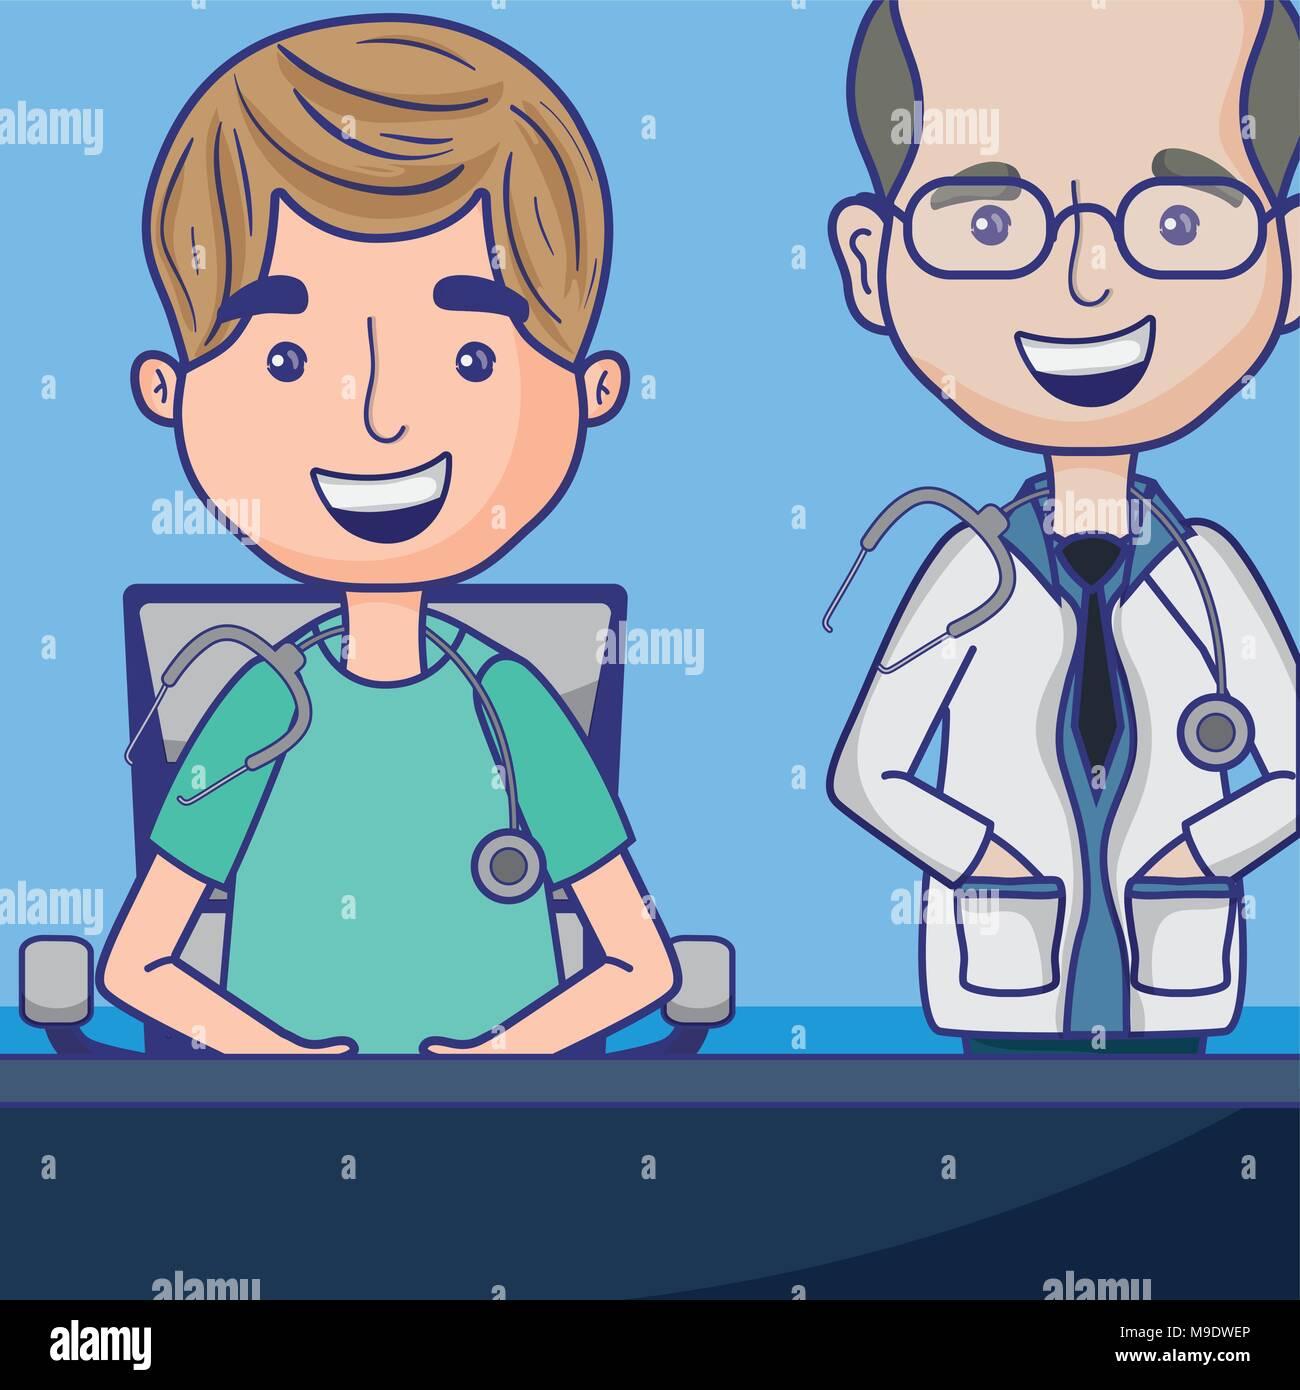 Funny Cartoon Hospital Pics two doctors talking hospital stock vector images - alamy